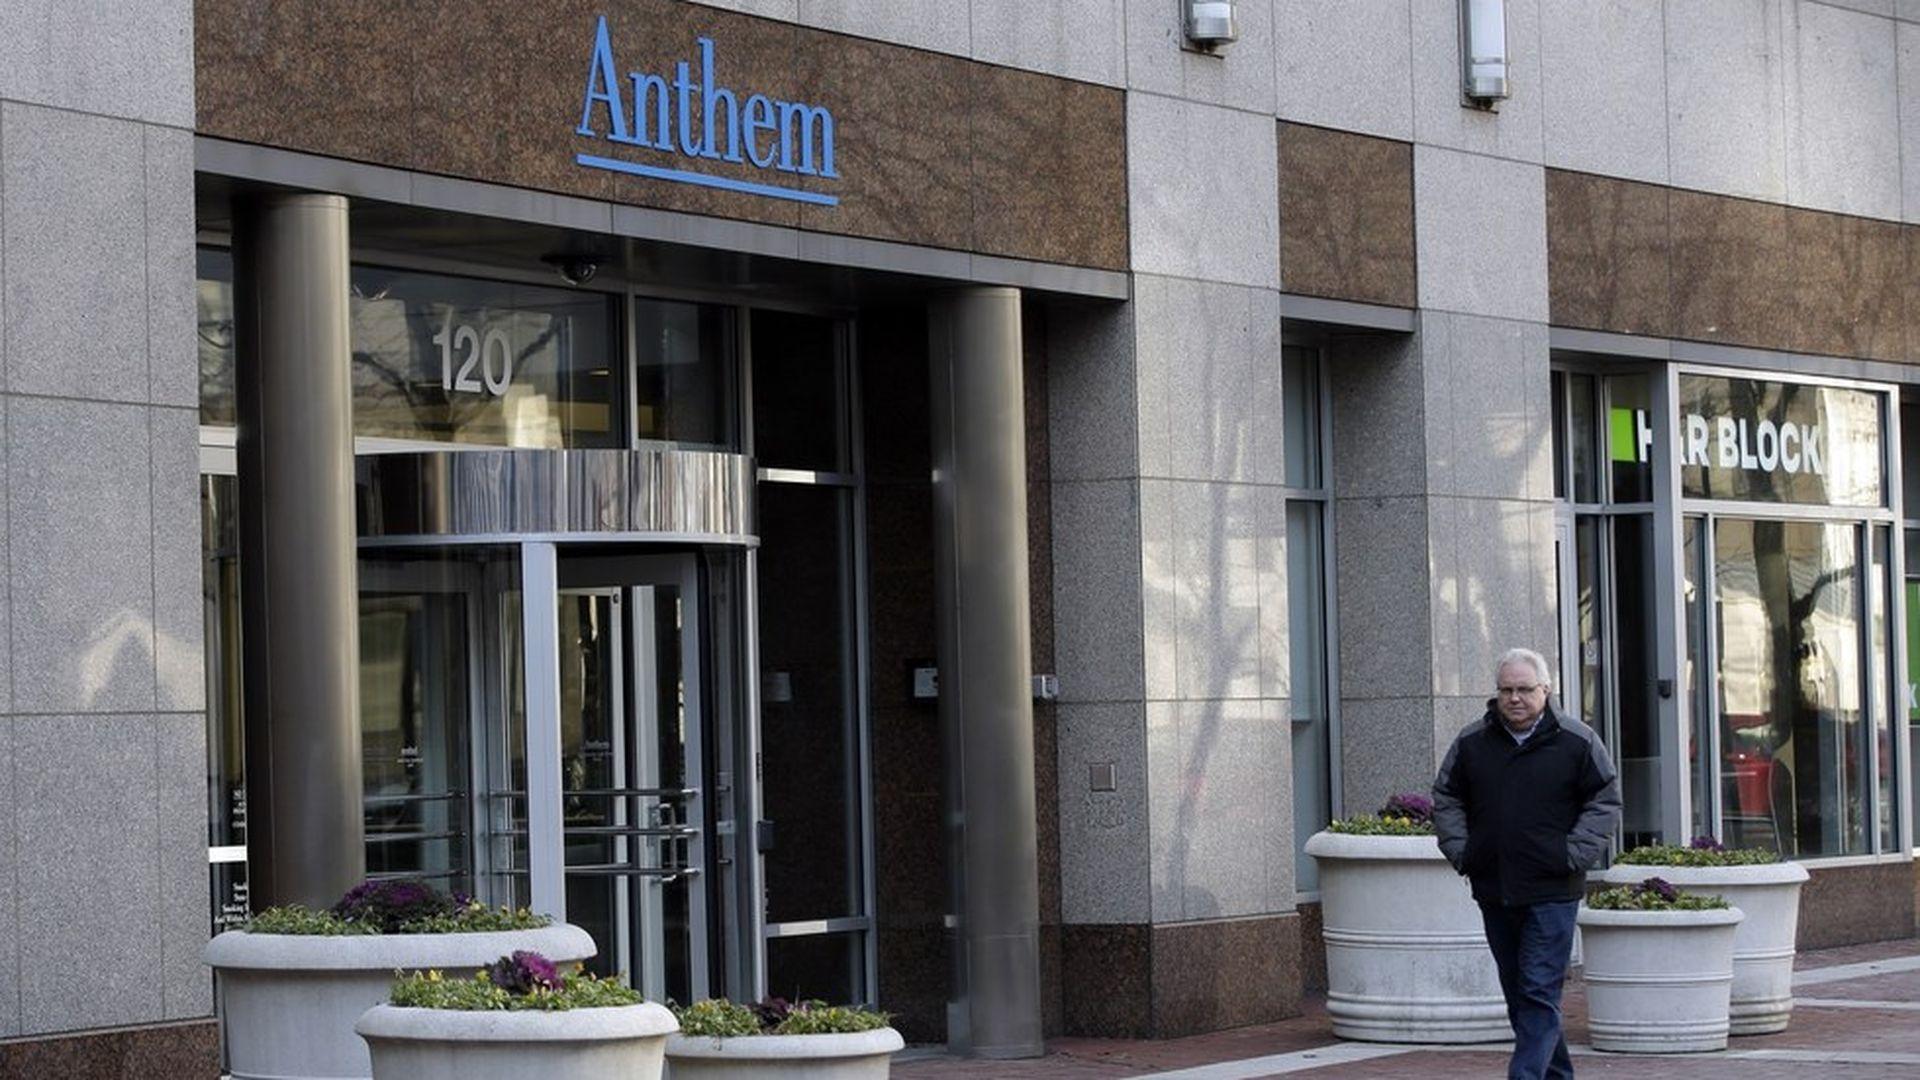 Anthem's historic data breach: What we still don't know 2